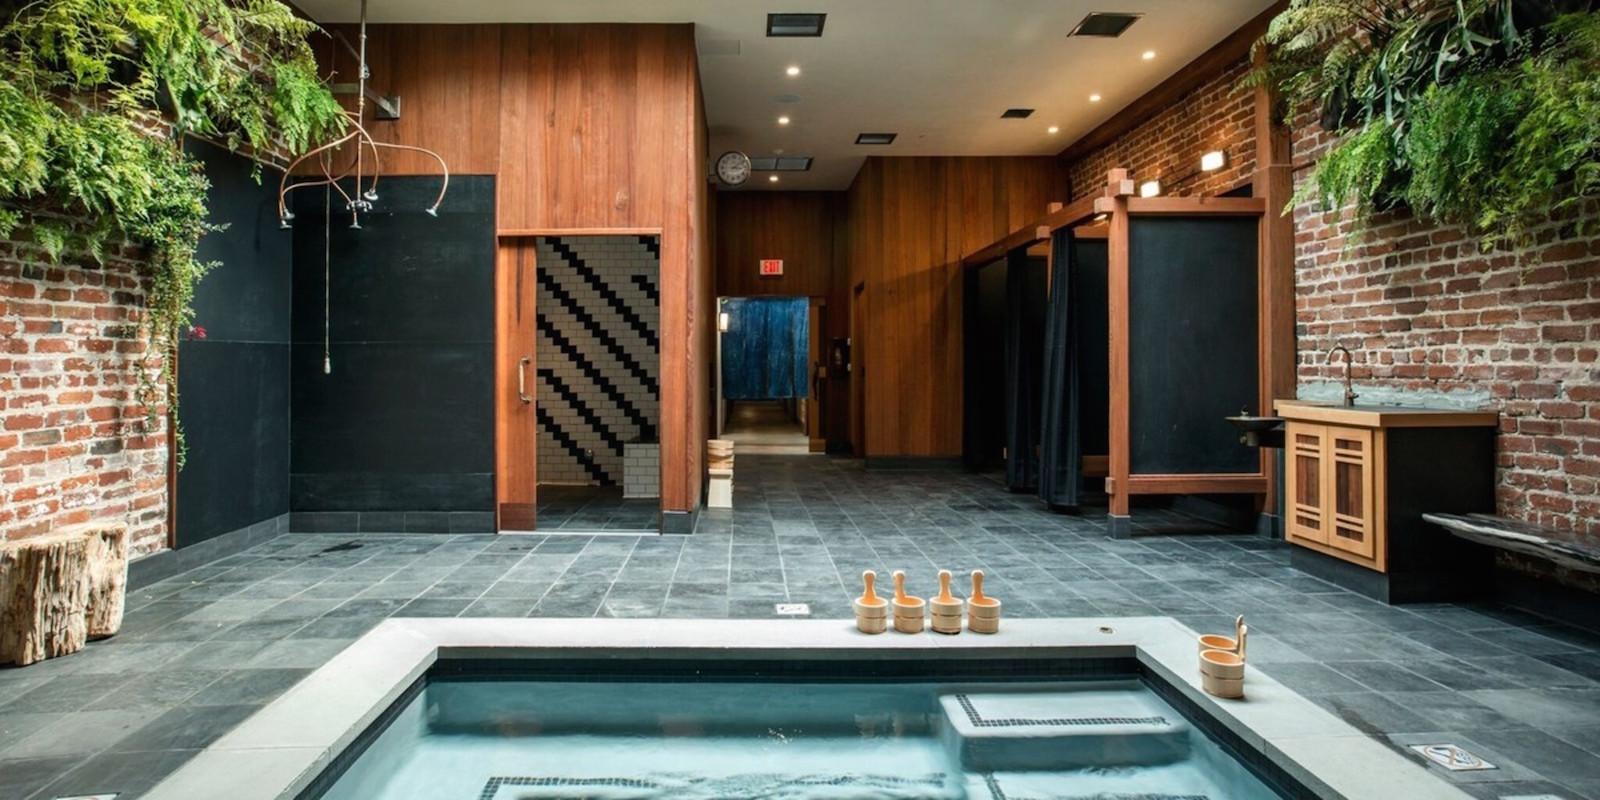 Onsen Design Zen Bath House In San Francisco on zen pool deck, zen pool book, minimalist pool design, zen pool comics,